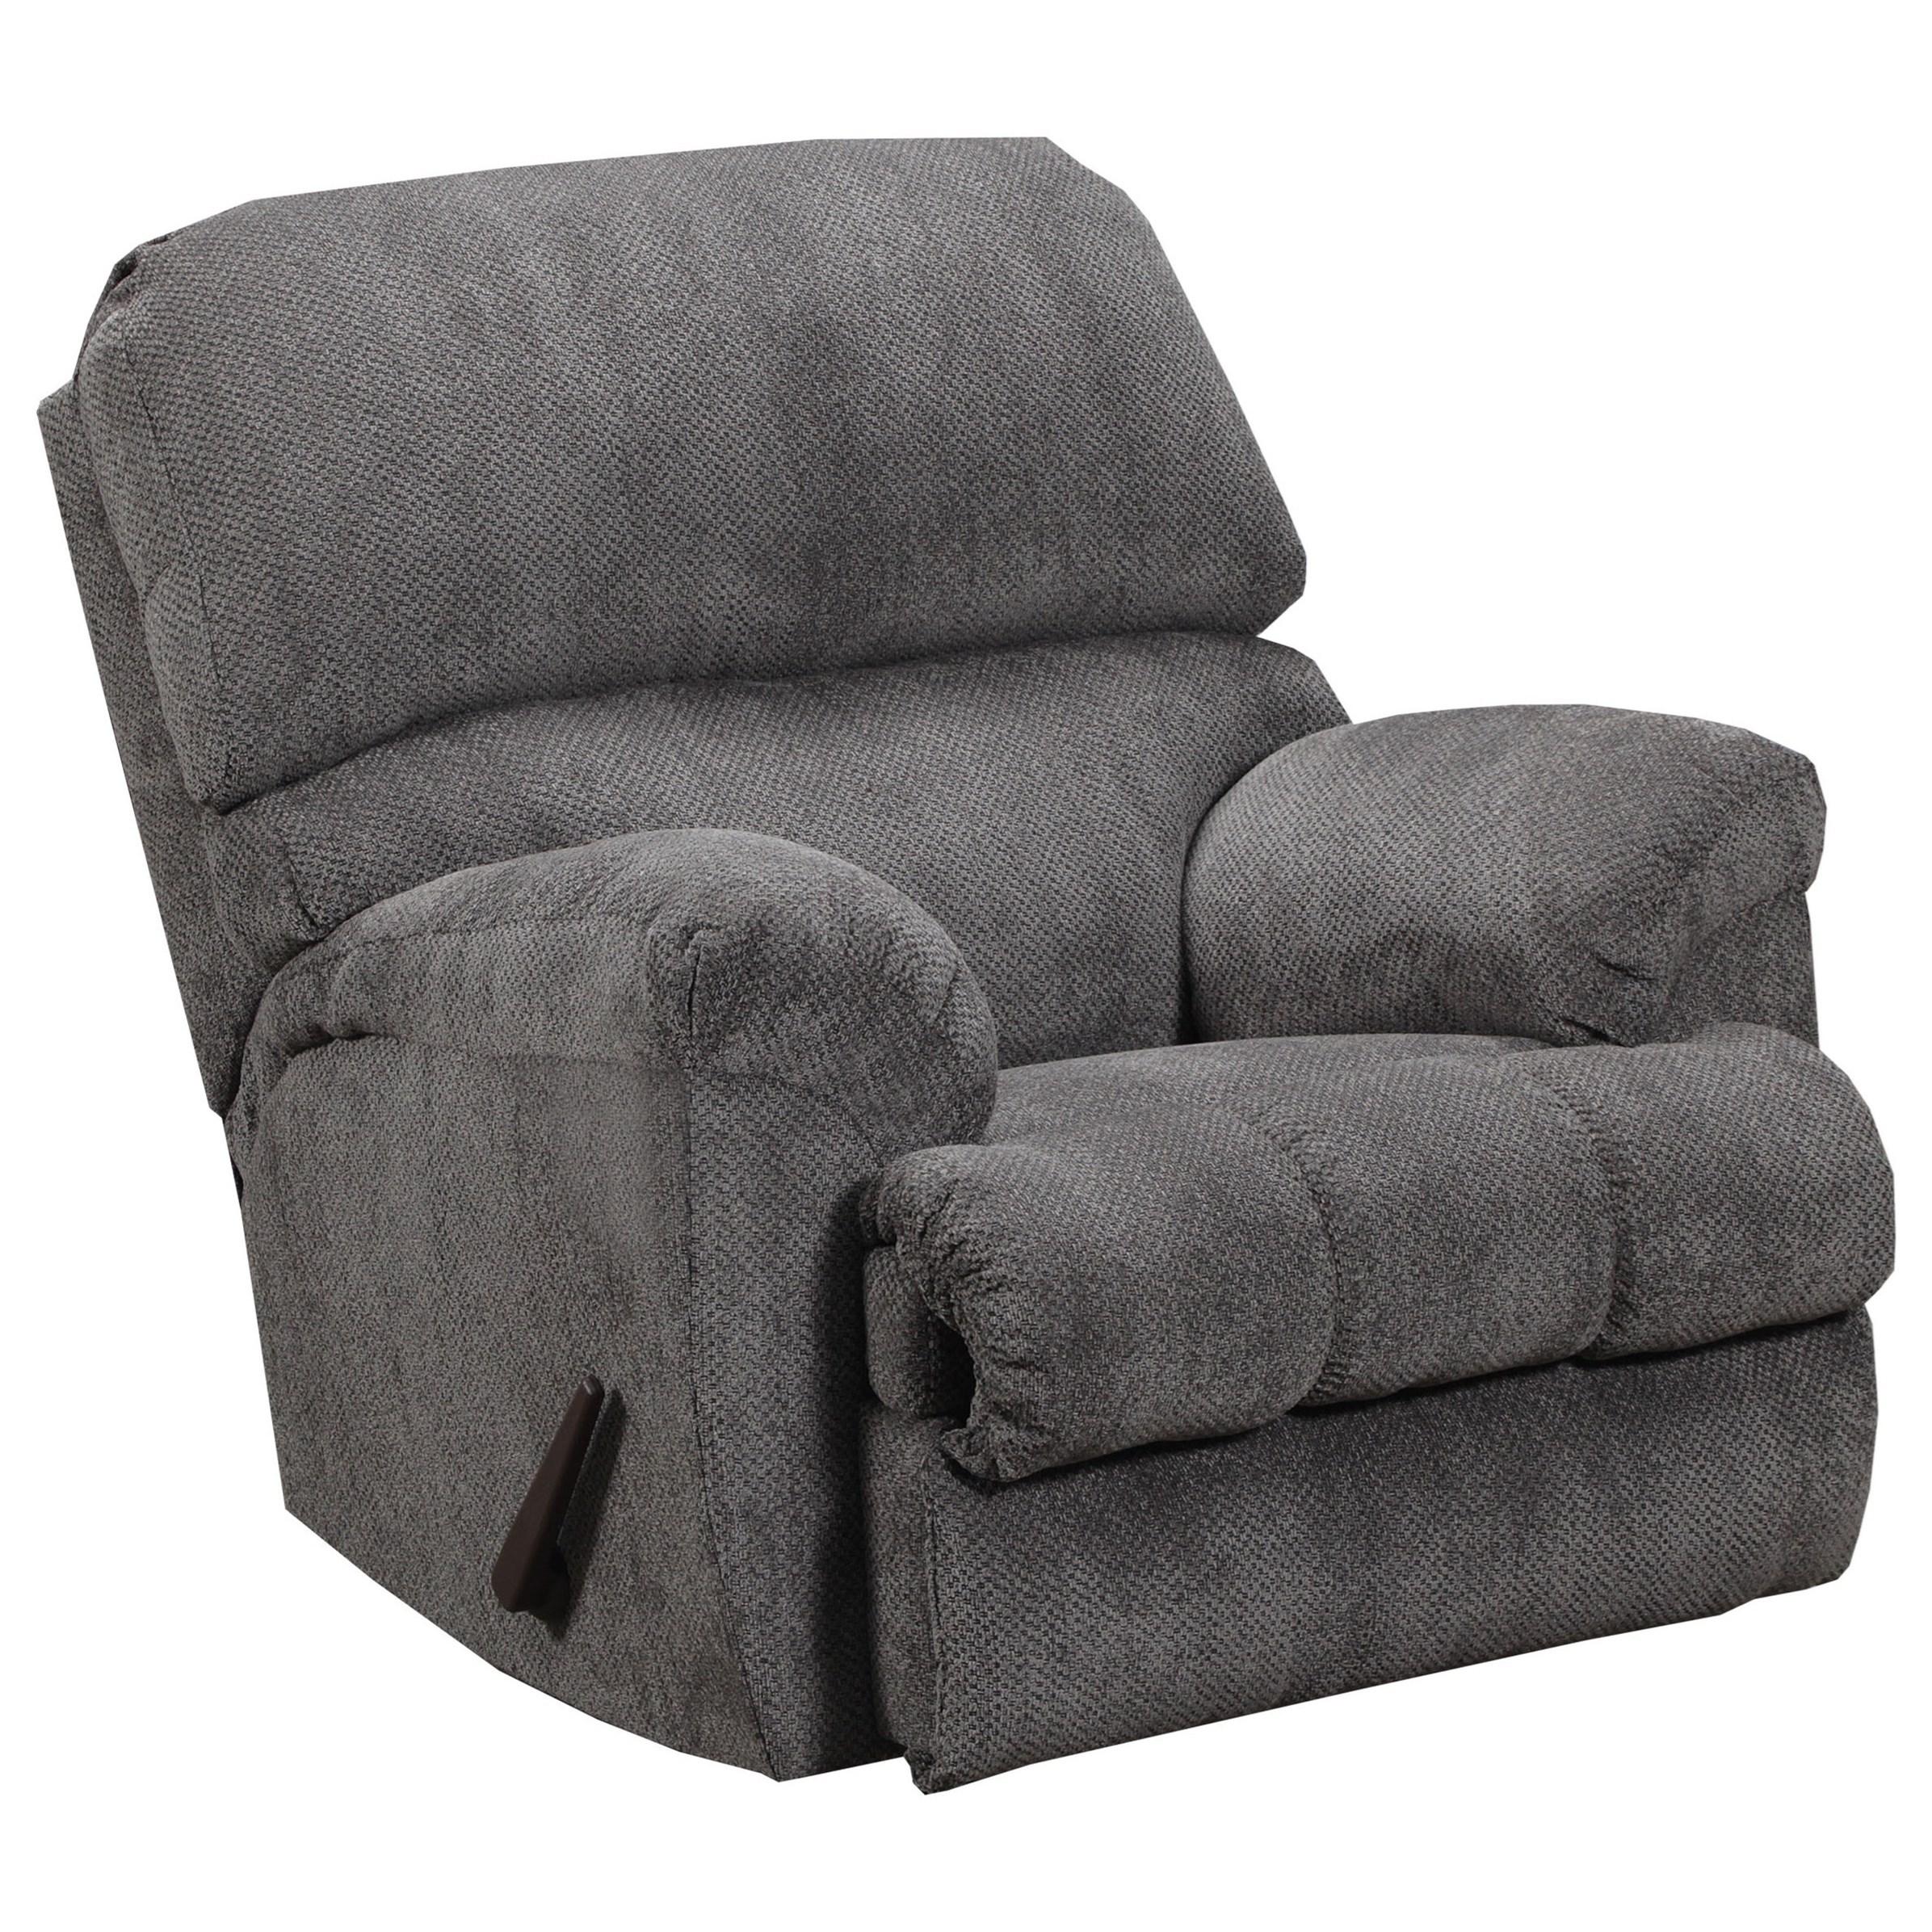 586 Rocker Recliner by United Furniture Industries at Bullard Furniture